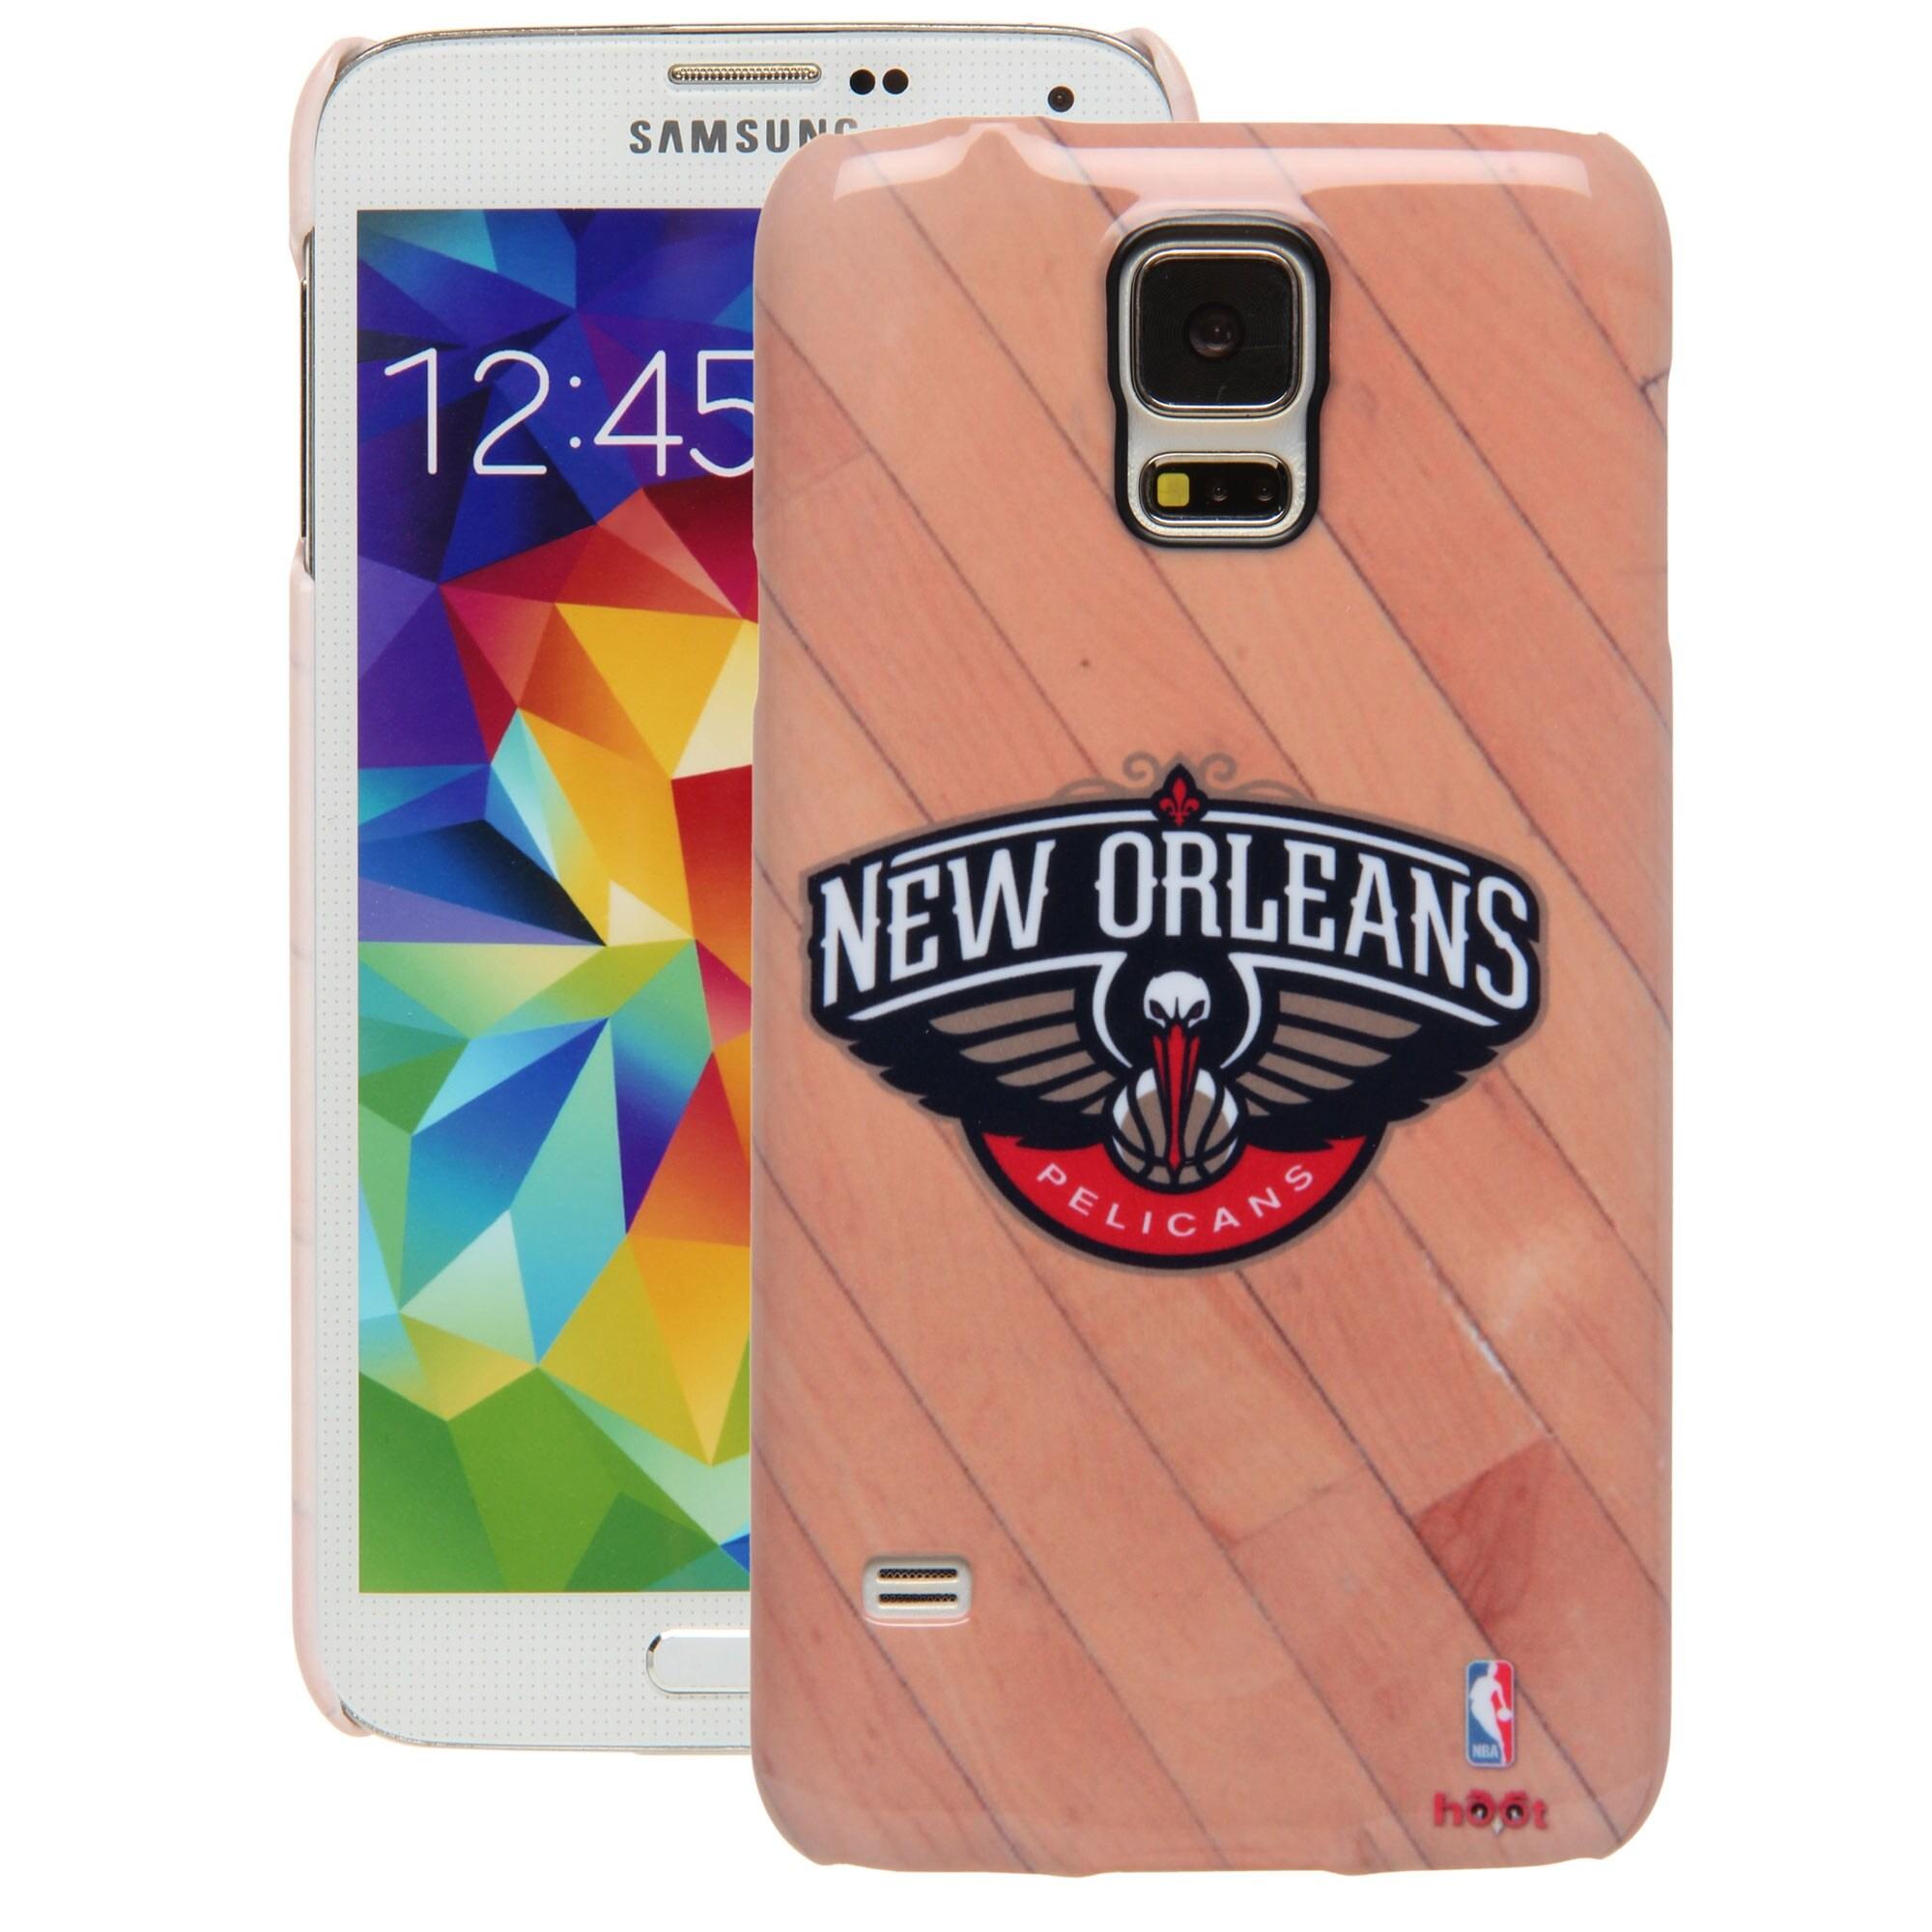 New Orleans Pelicans Galaxy S5 Hardwood Court Case